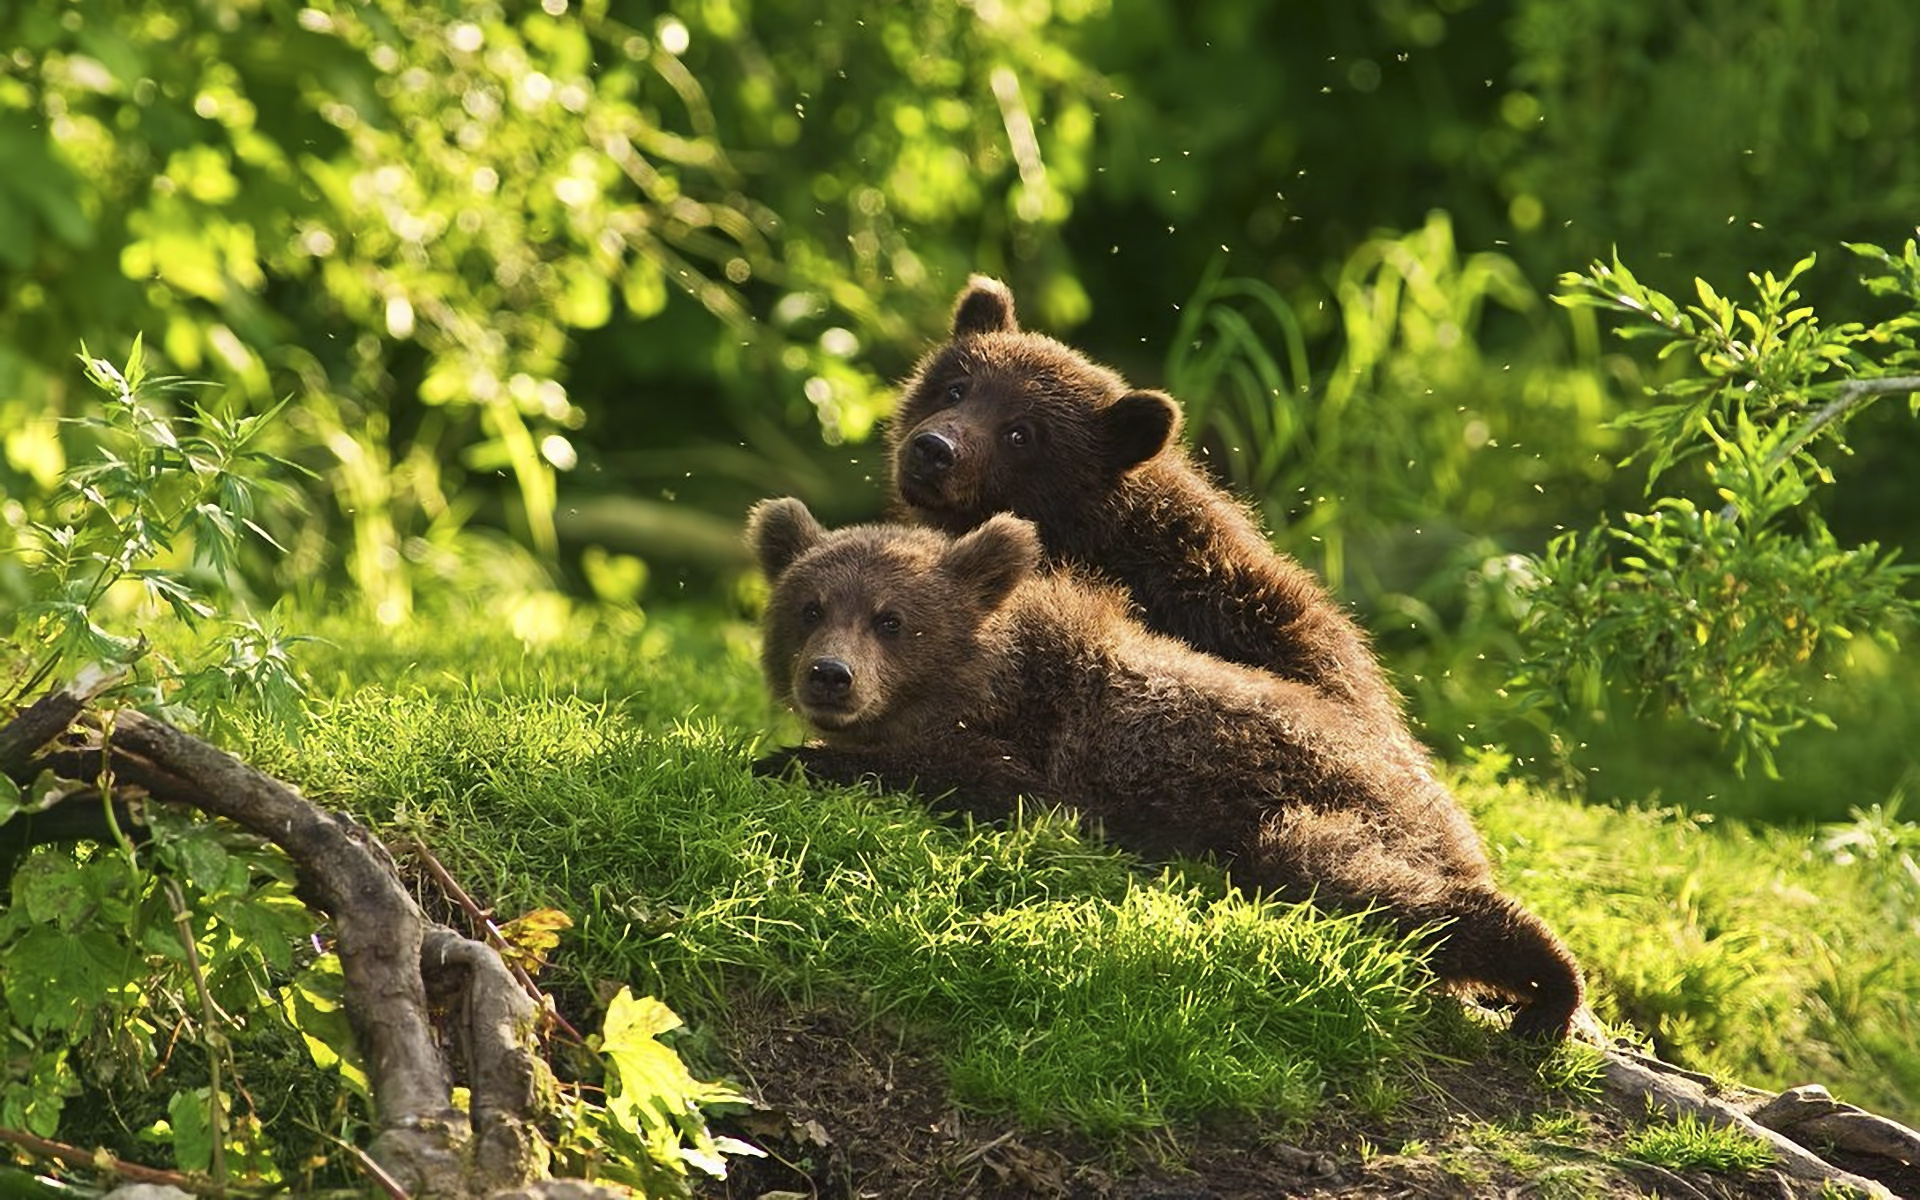 мишки, медвежата, бурые